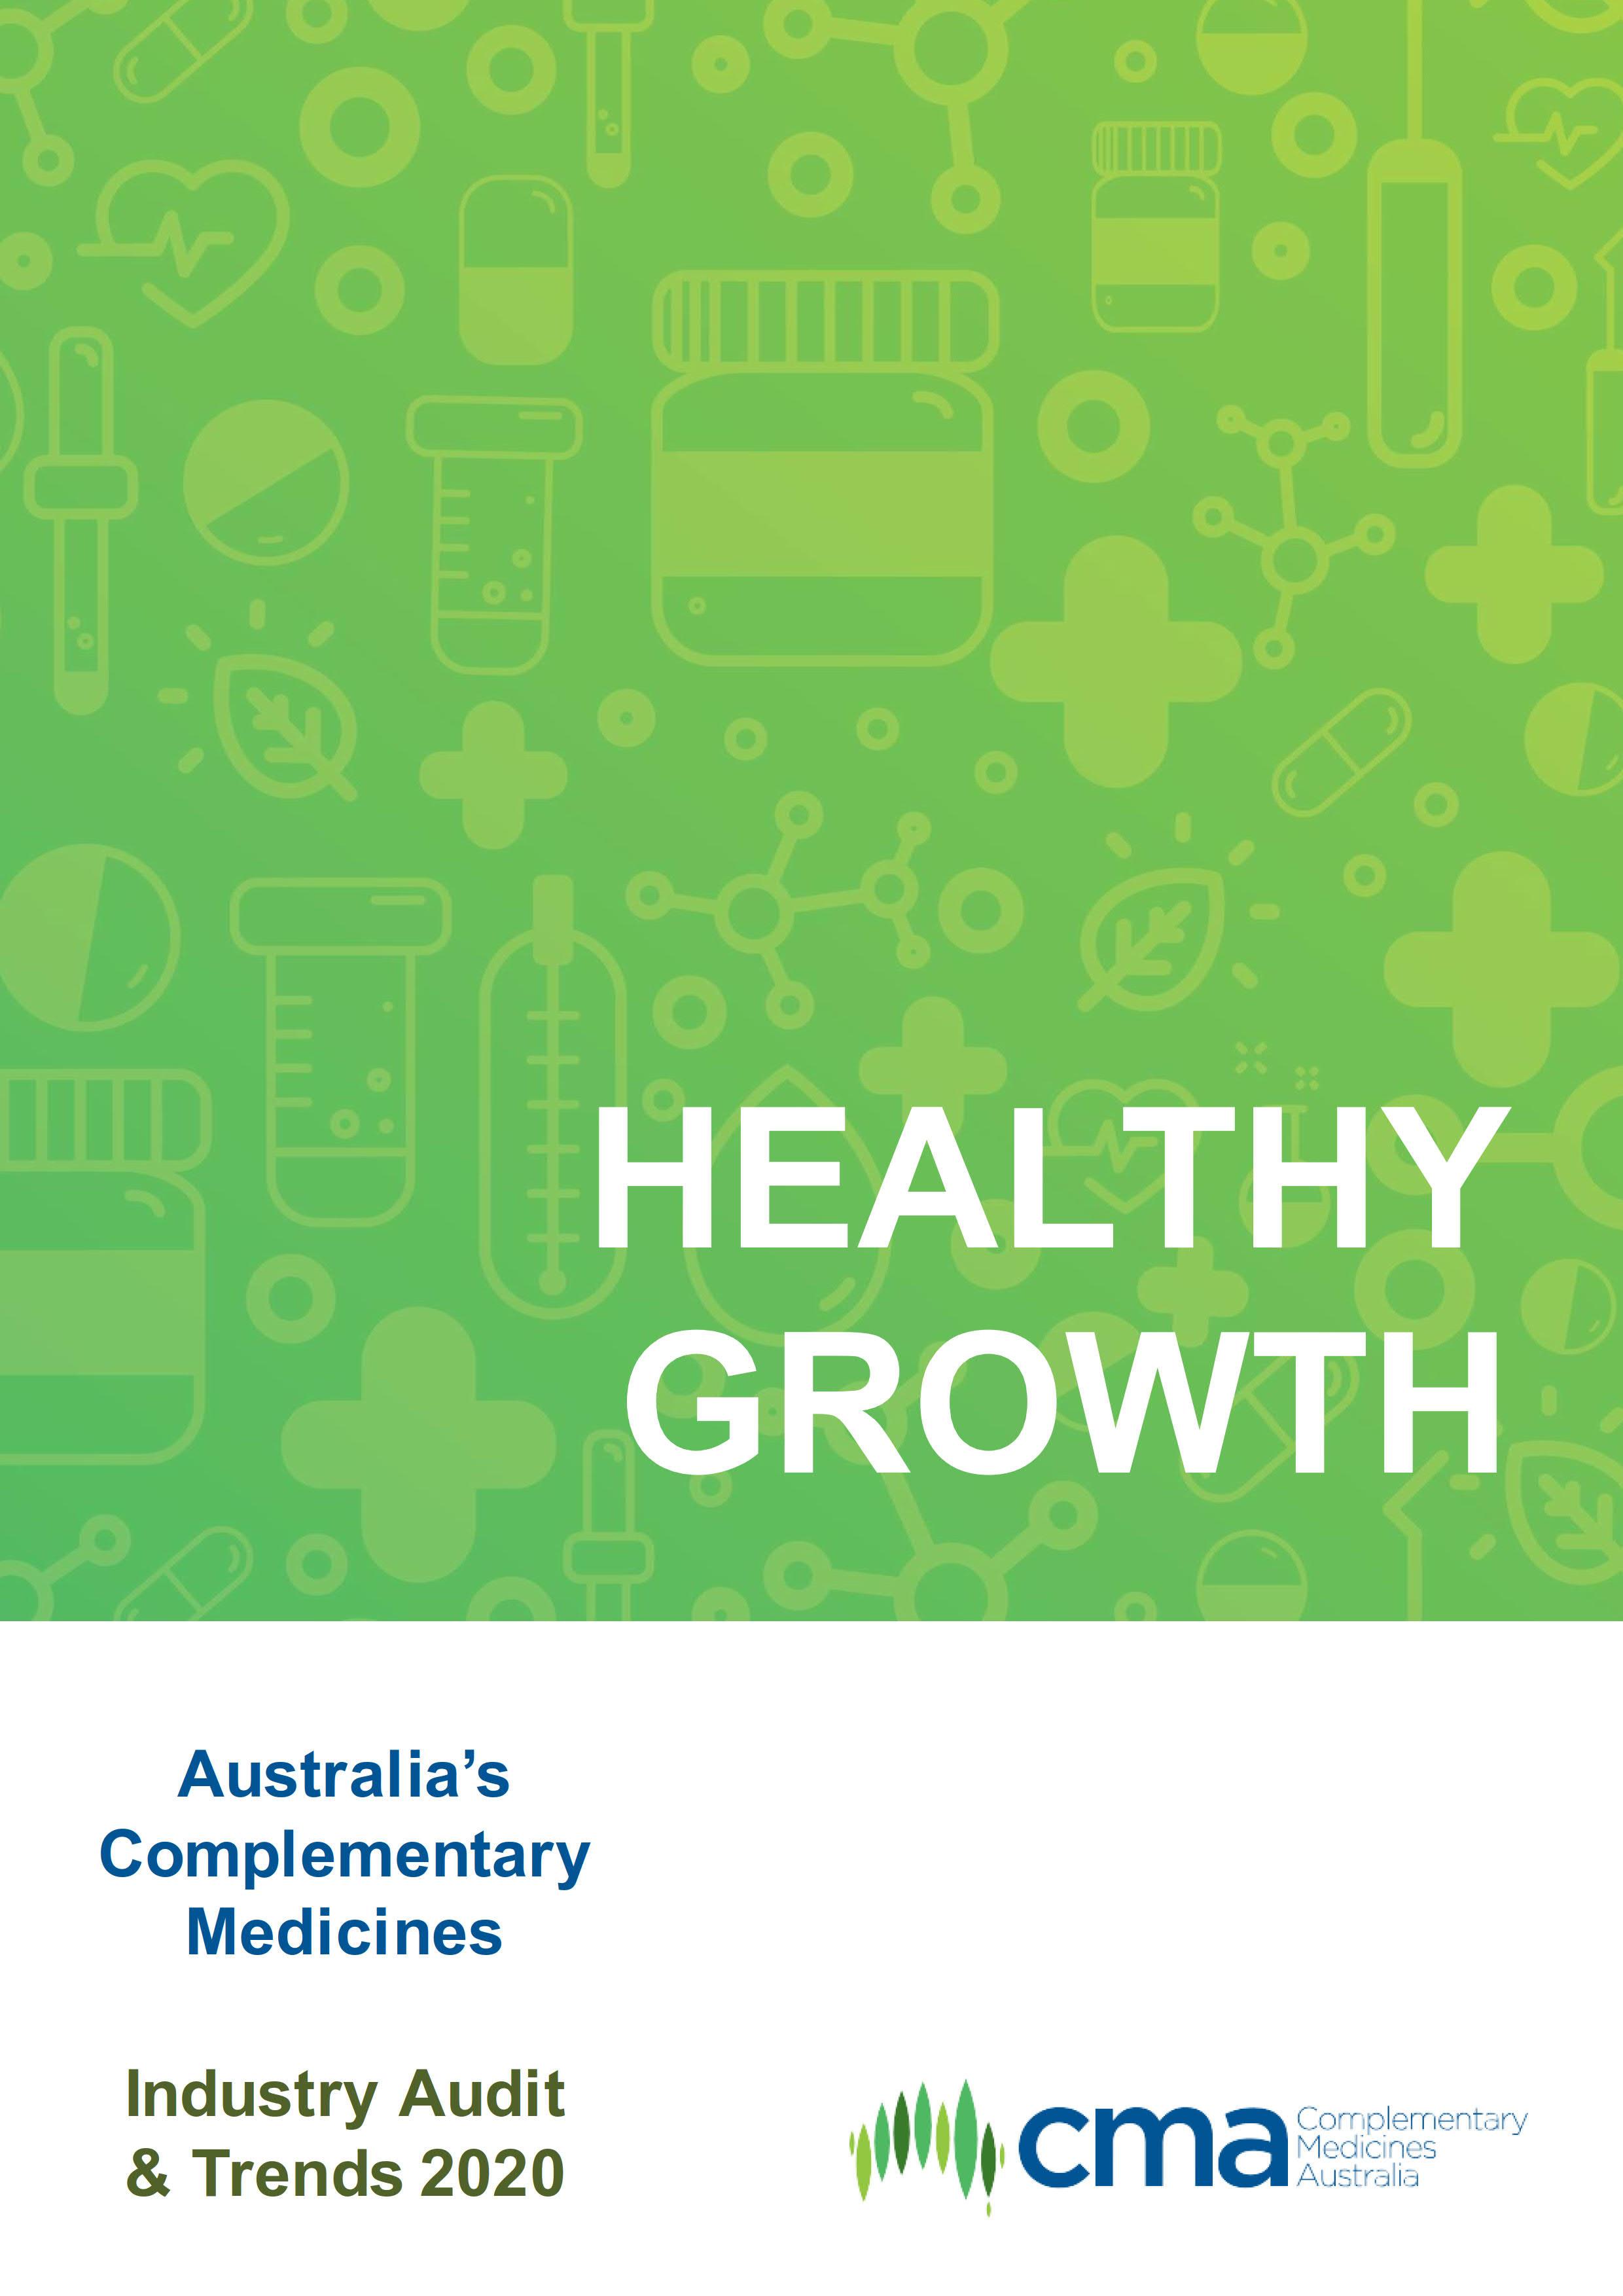 Australia's Complementary Medicines Industry Audit & Trends 2020